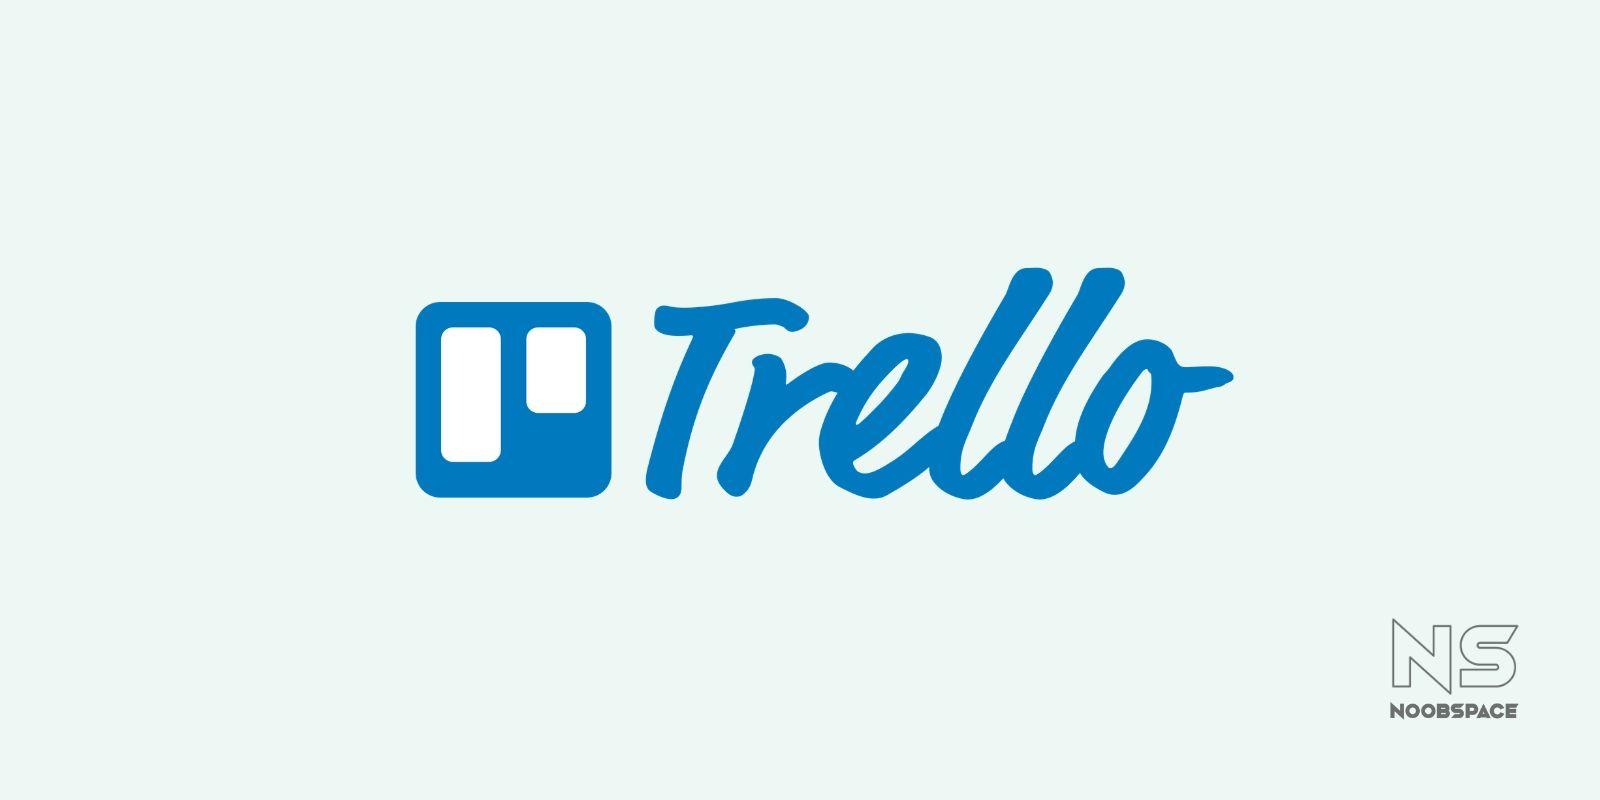 trello featured image